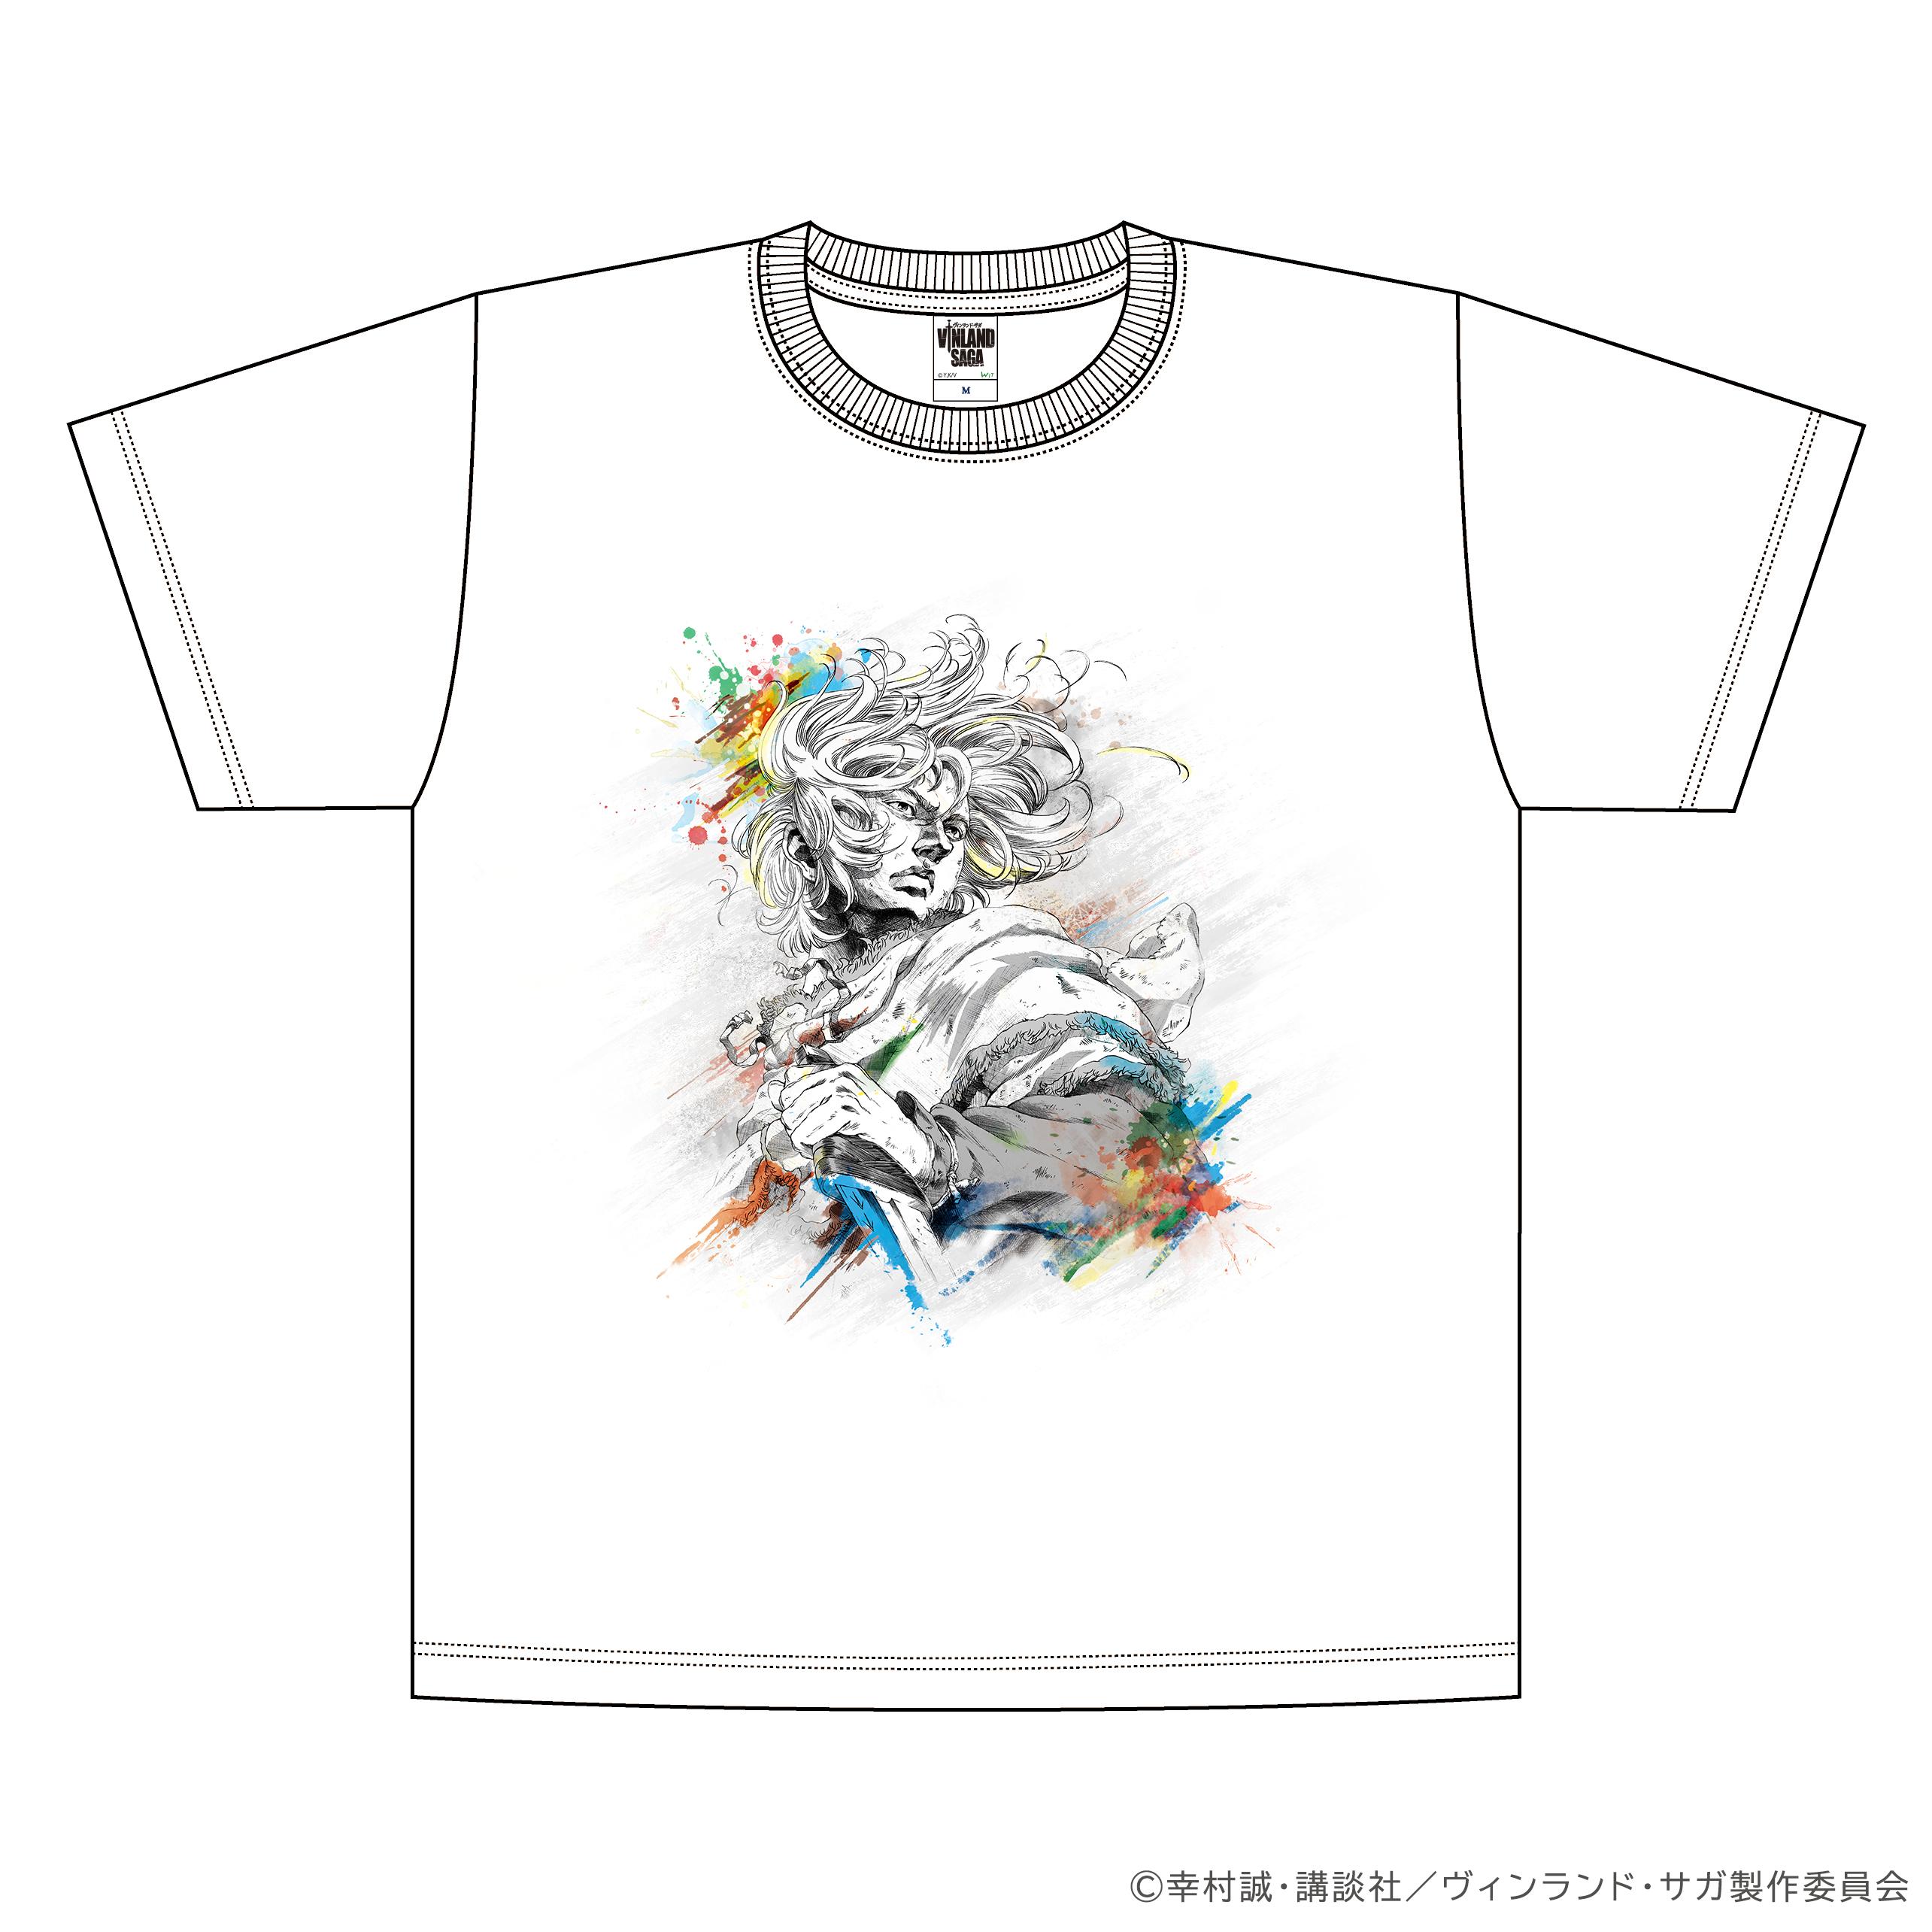 'WIT STUDIO'より『ヴィンランド・サガ お疲れさま本』発売記念グッズの販売決定!